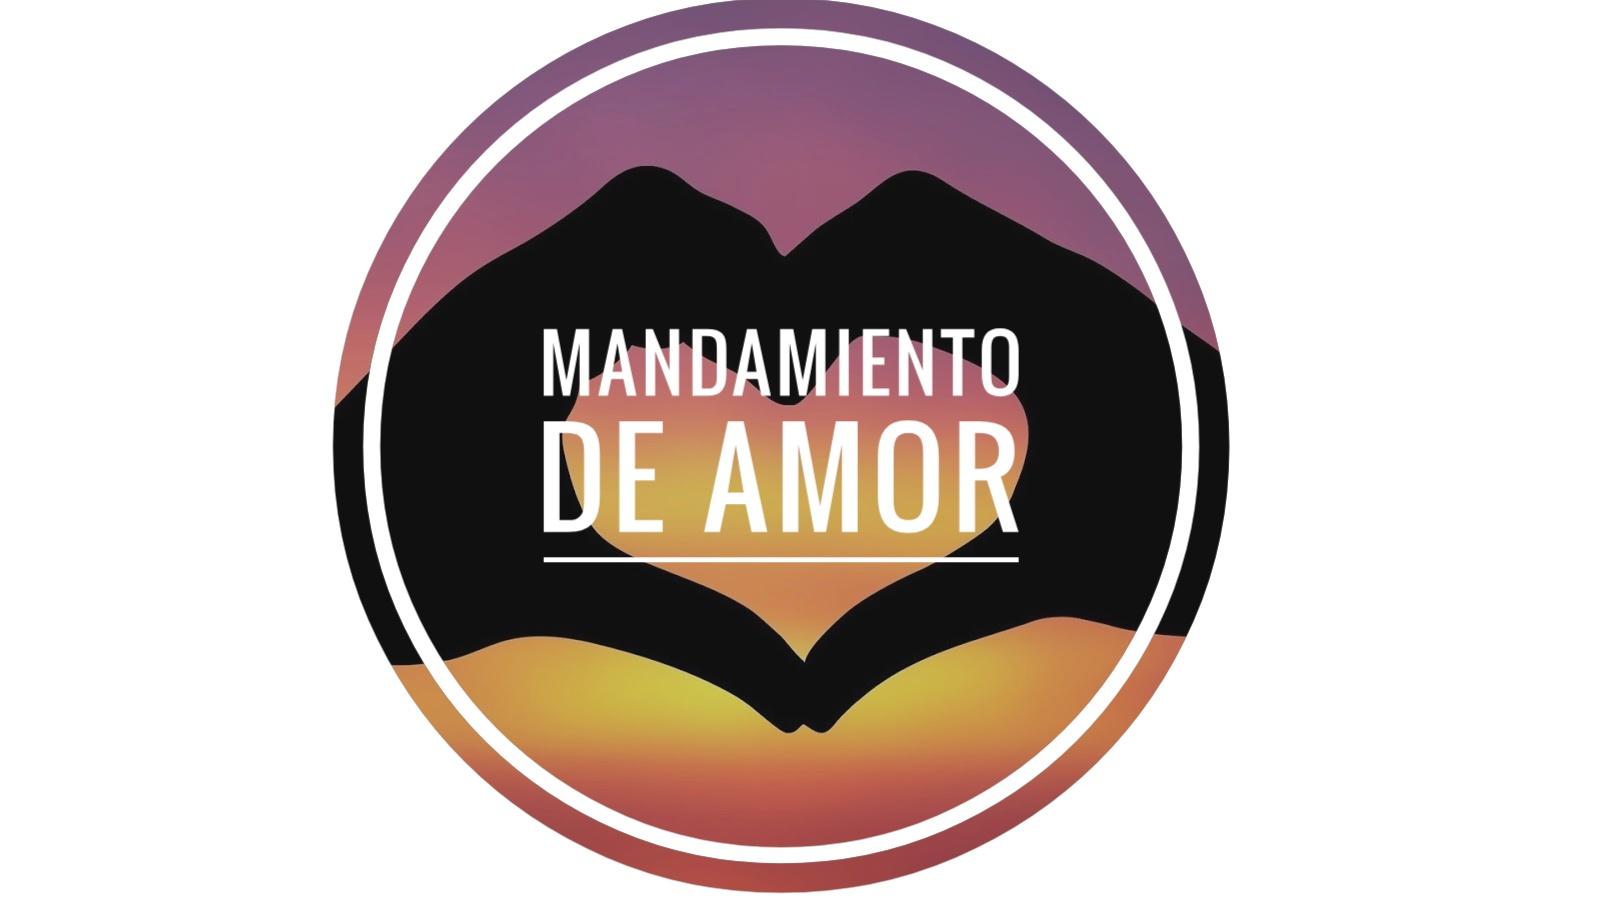 mandamiento de amor 06.30.19.jpeg